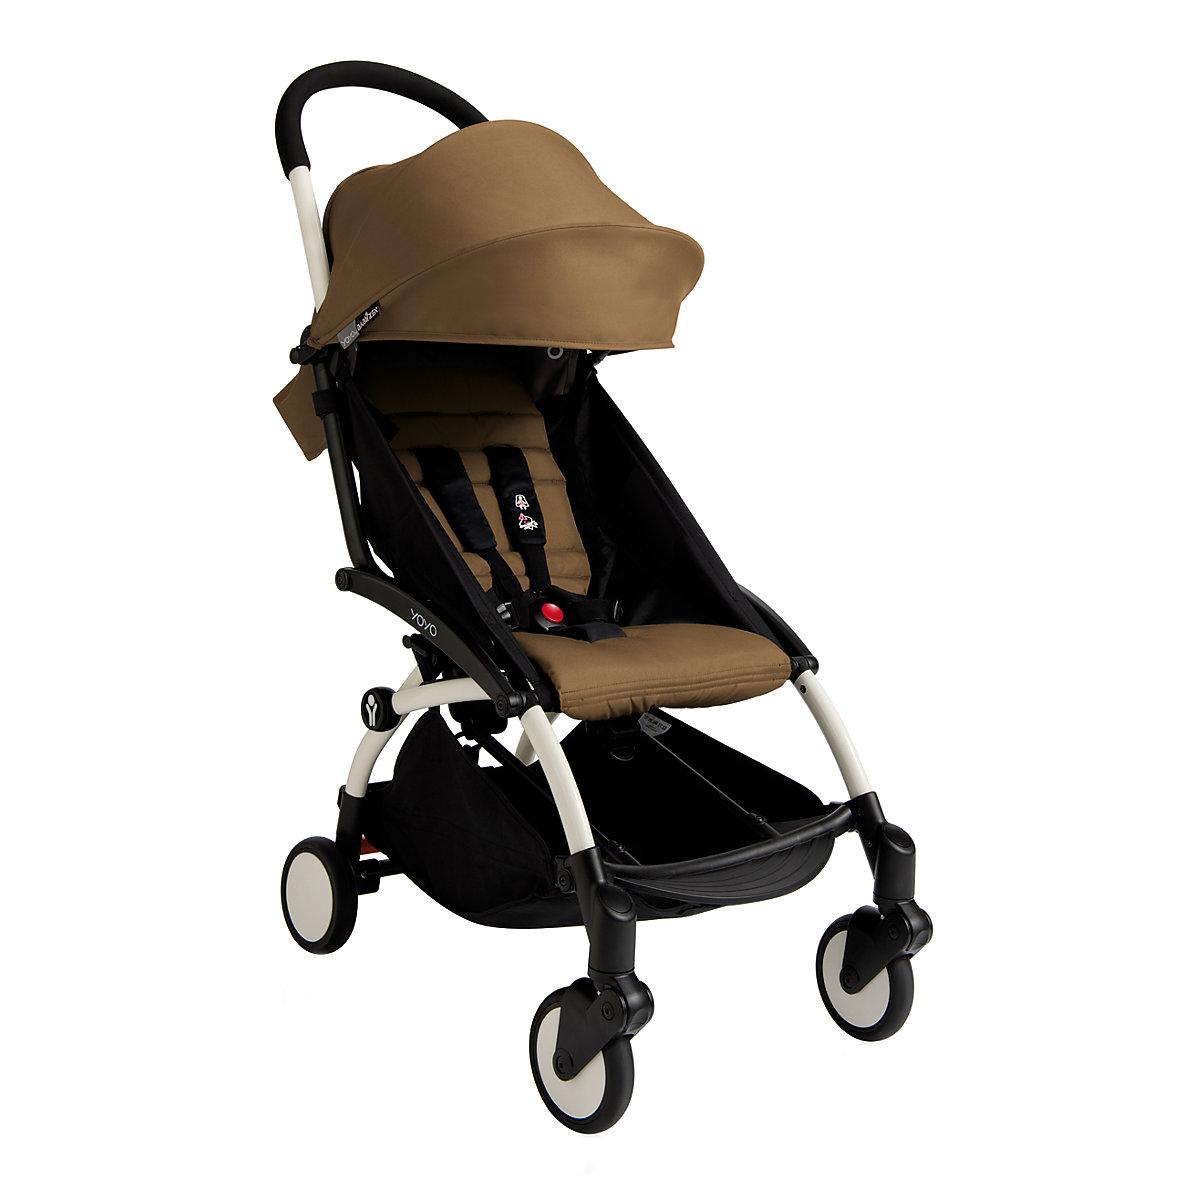 Babyzen YOYO+ 6+ stroller - white/toffee